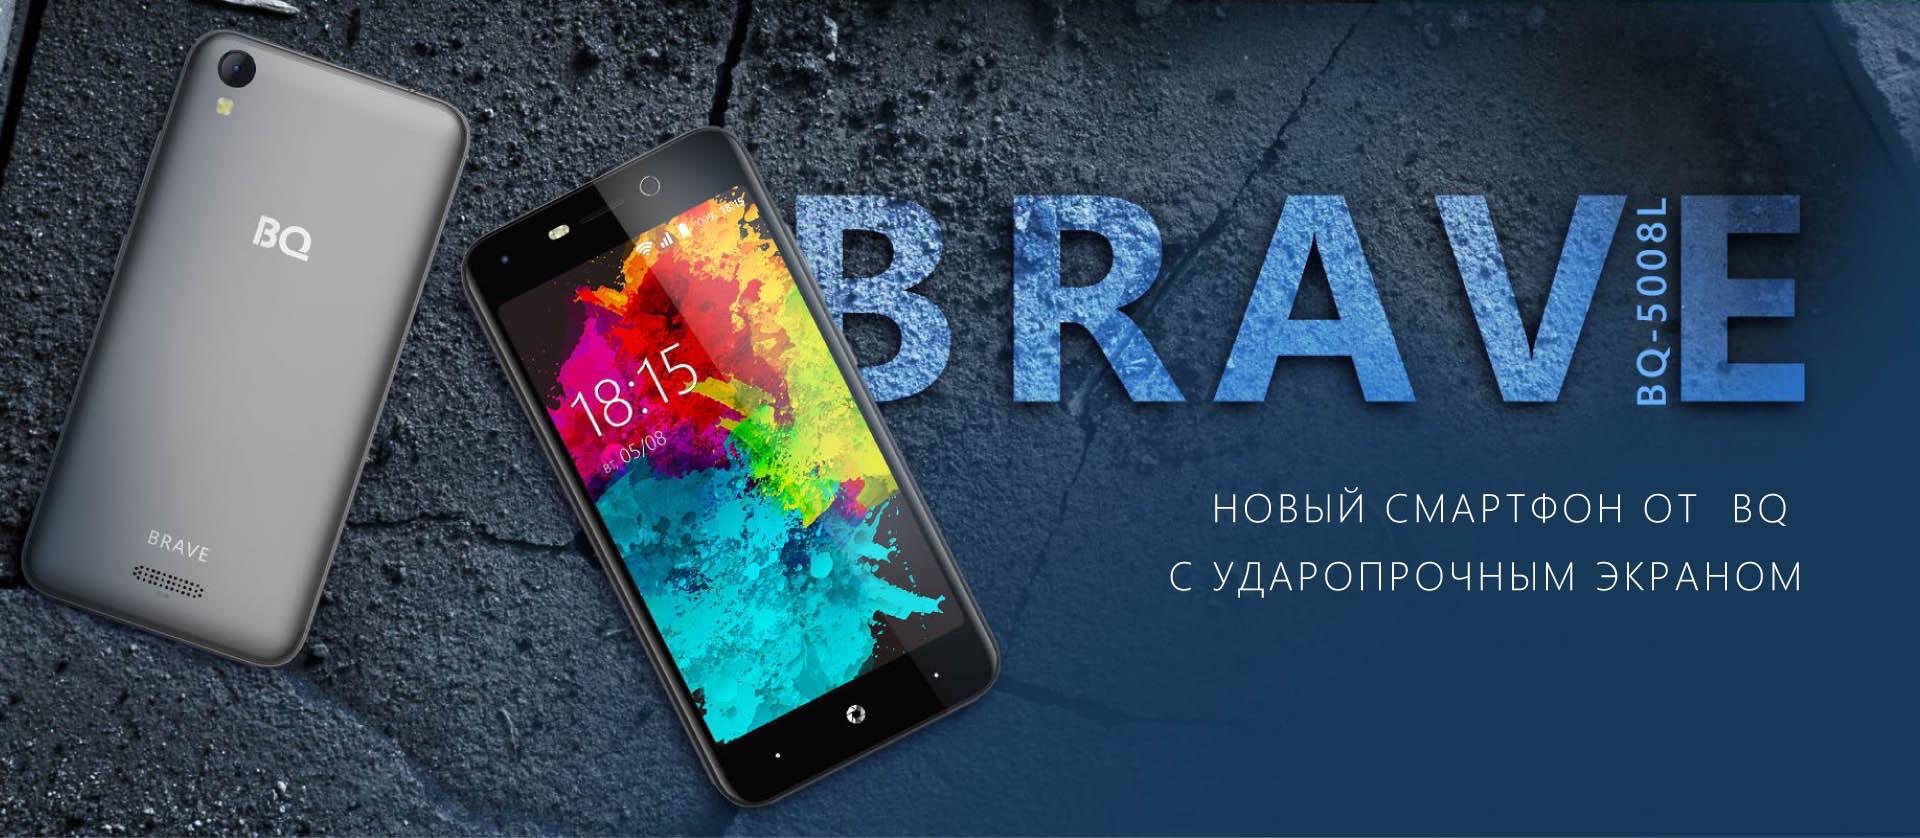 BQ-5008L-Brave-presentation